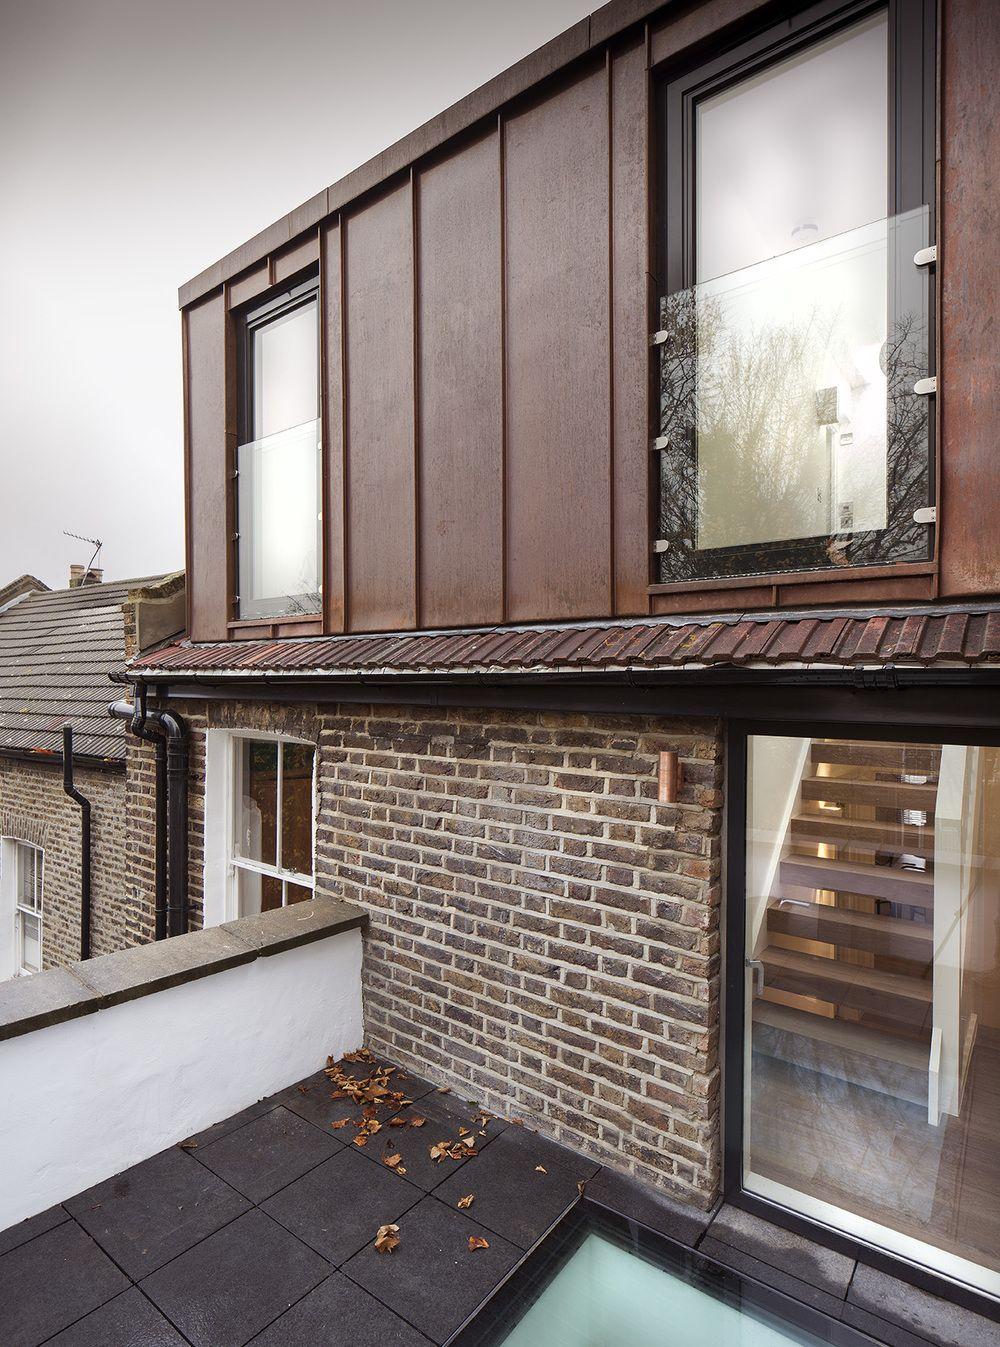 Exterior View Copper Clad Dormer Glass Balustrades